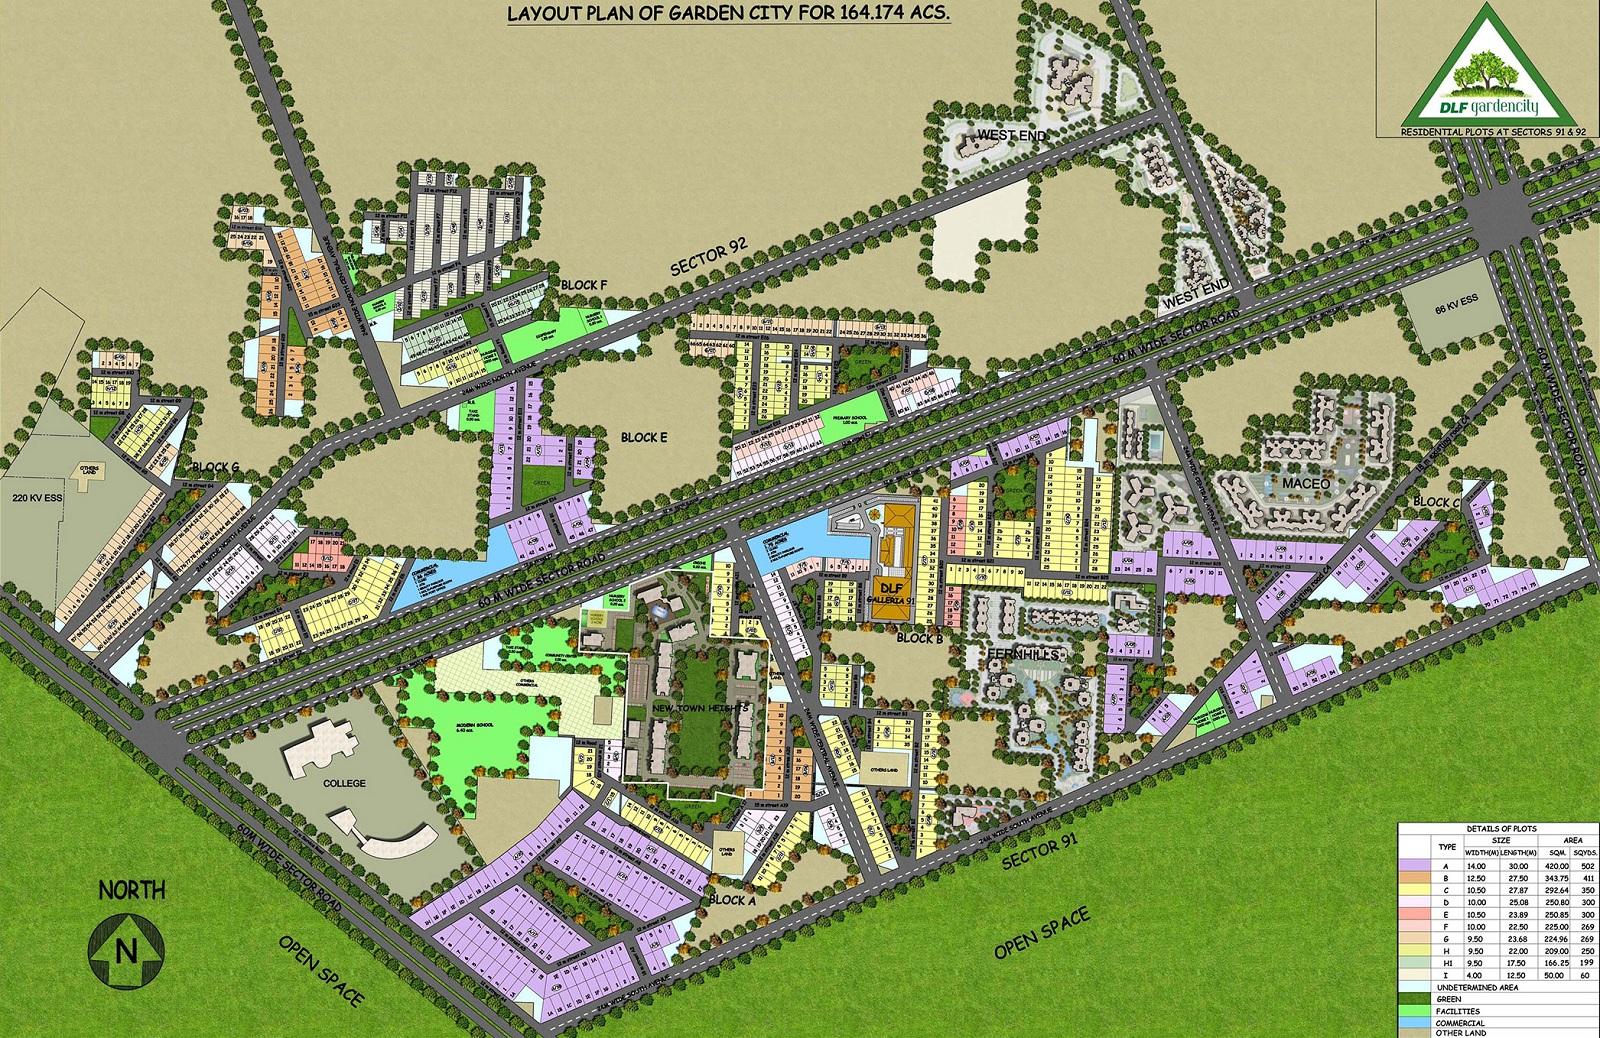 dlf garden city plots i project master plan image1